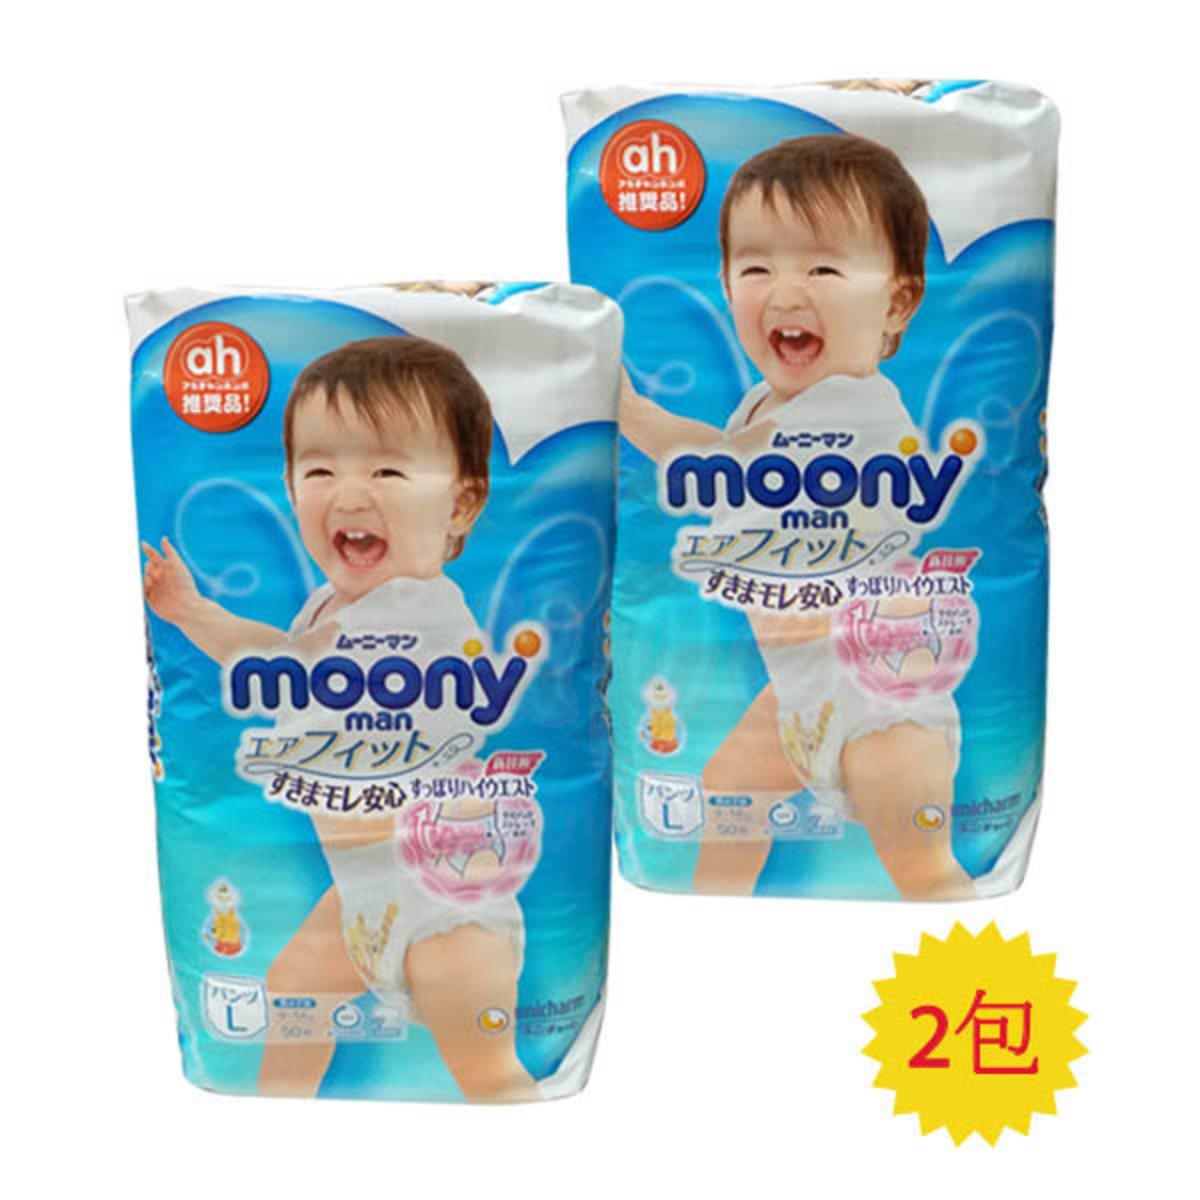 Moony L Boy Pants 50pcs x 2packs